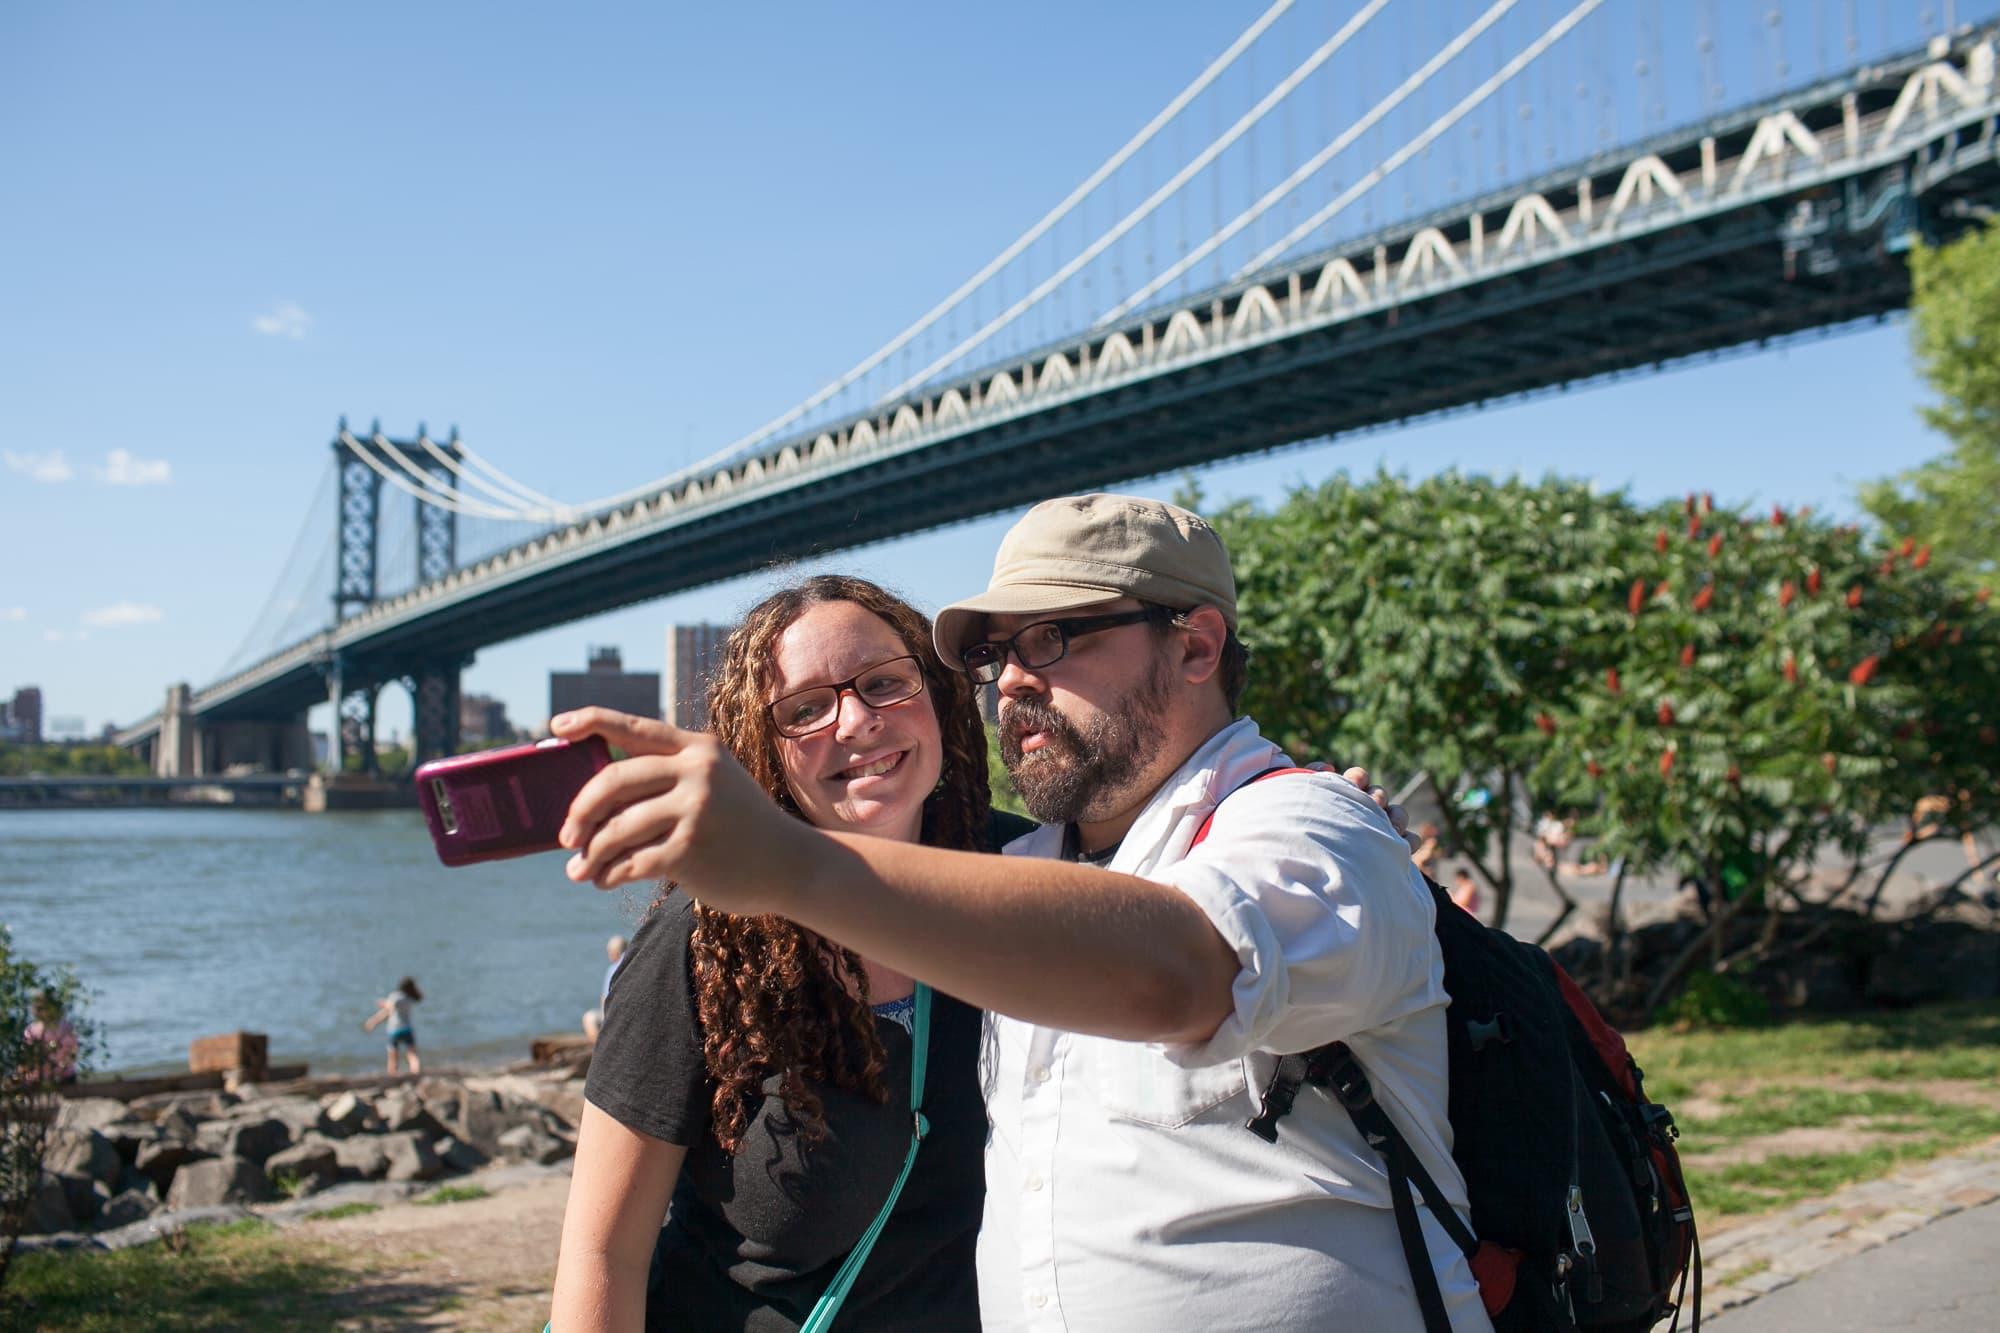 Photo in front of the Manhattan Bridge